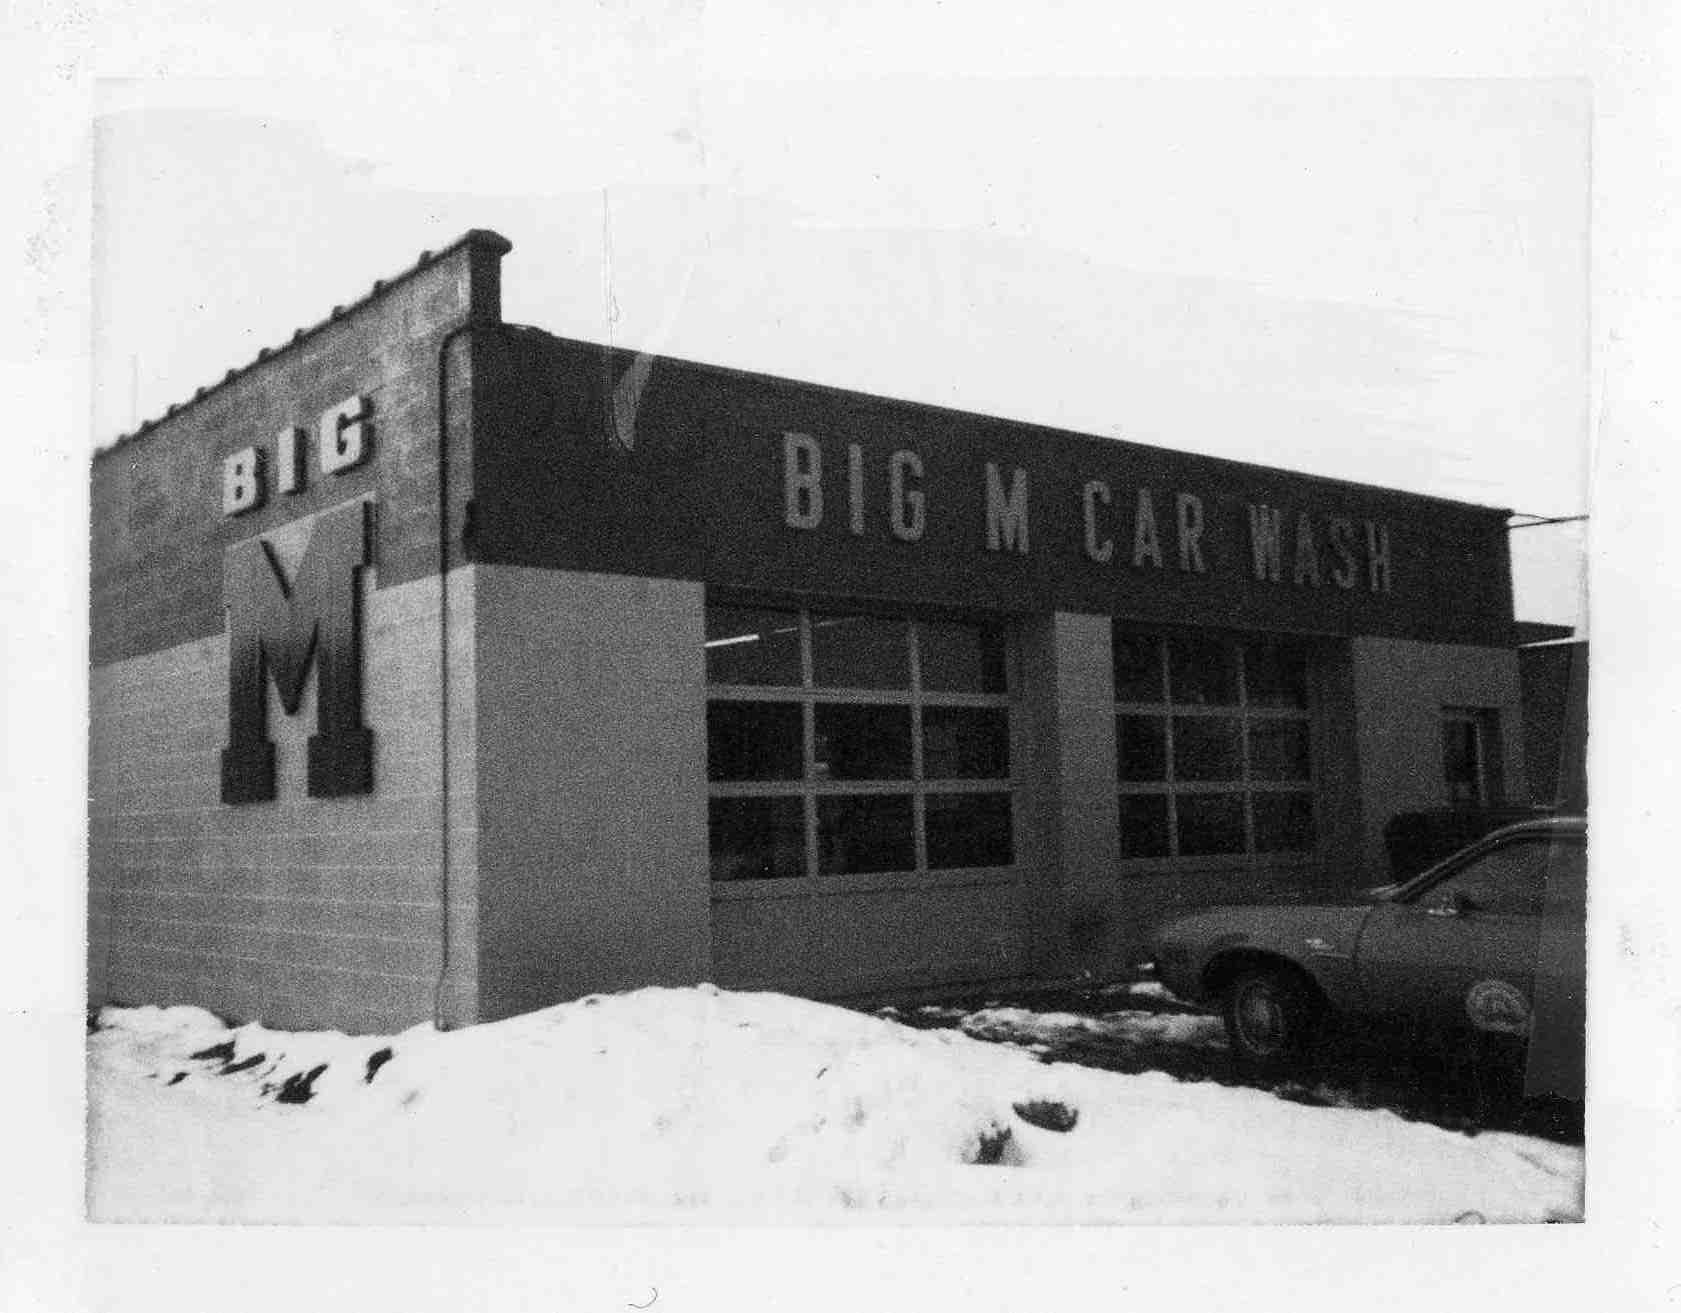 big m car wash 1974 ann arbor district library. Black Bedroom Furniture Sets. Home Design Ideas